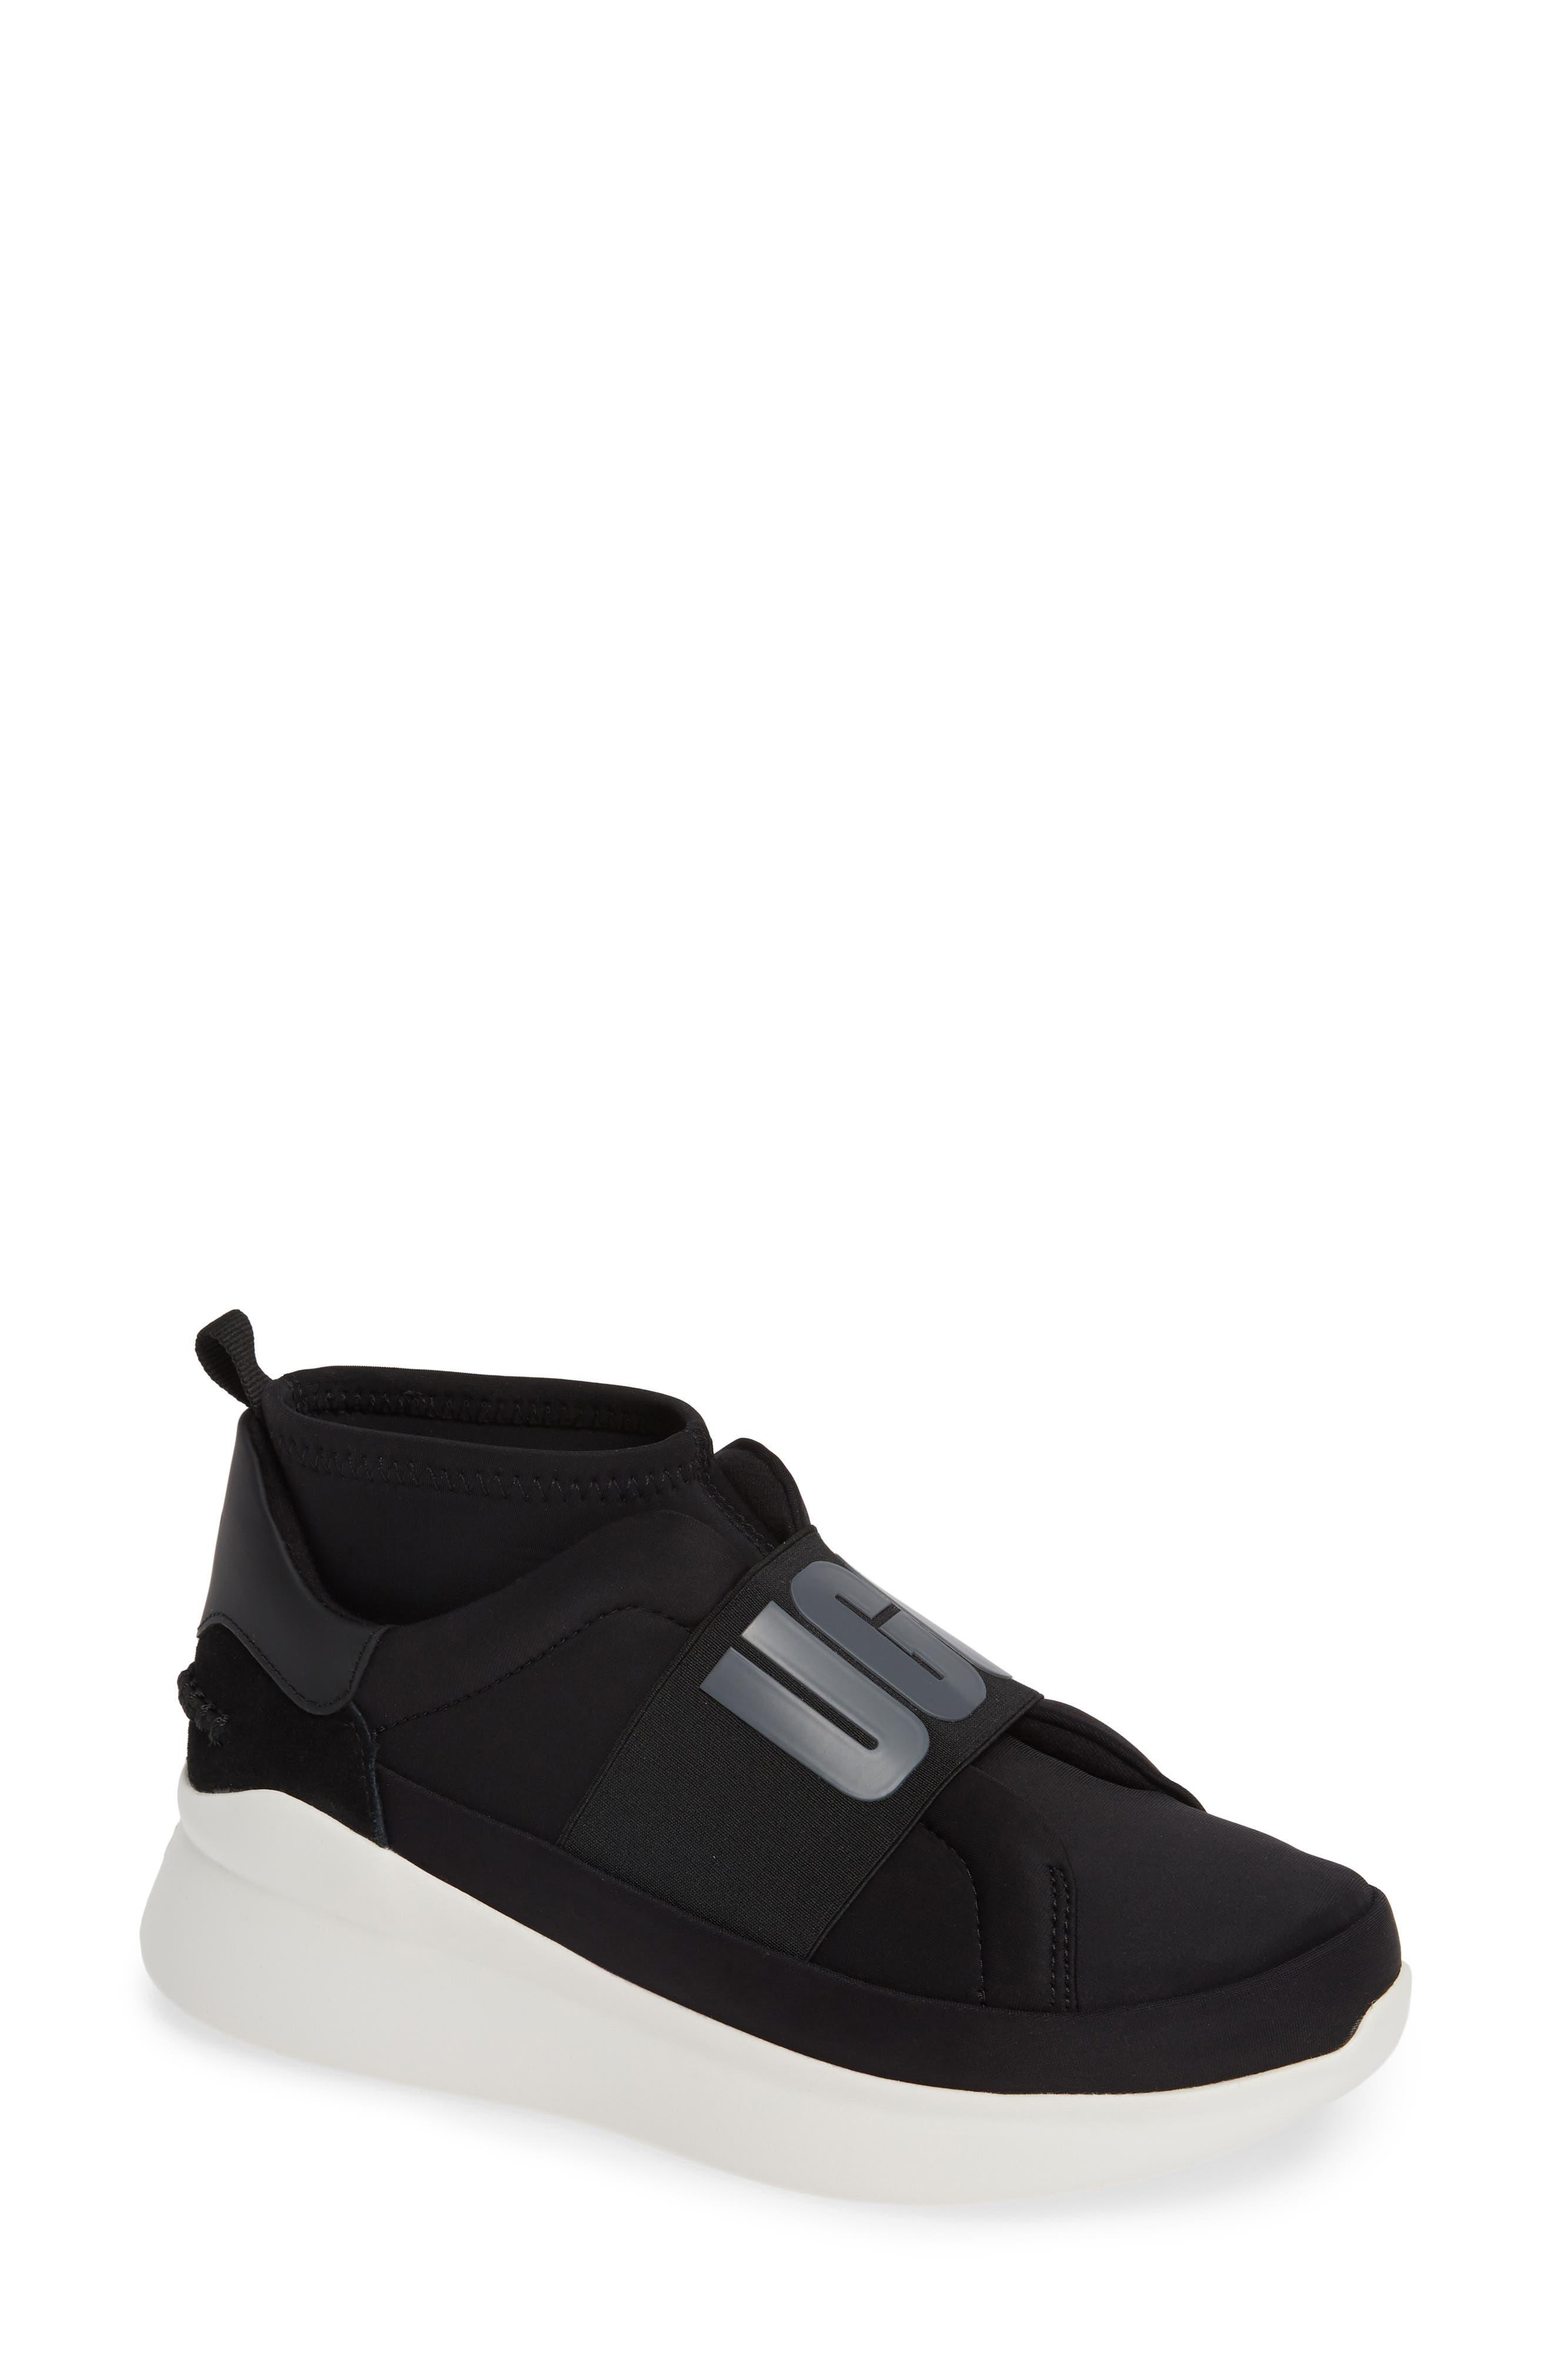 UGG<SUP>®</SUP>, Neutra Sock Sneaker, Main thumbnail 1, color, BLACK